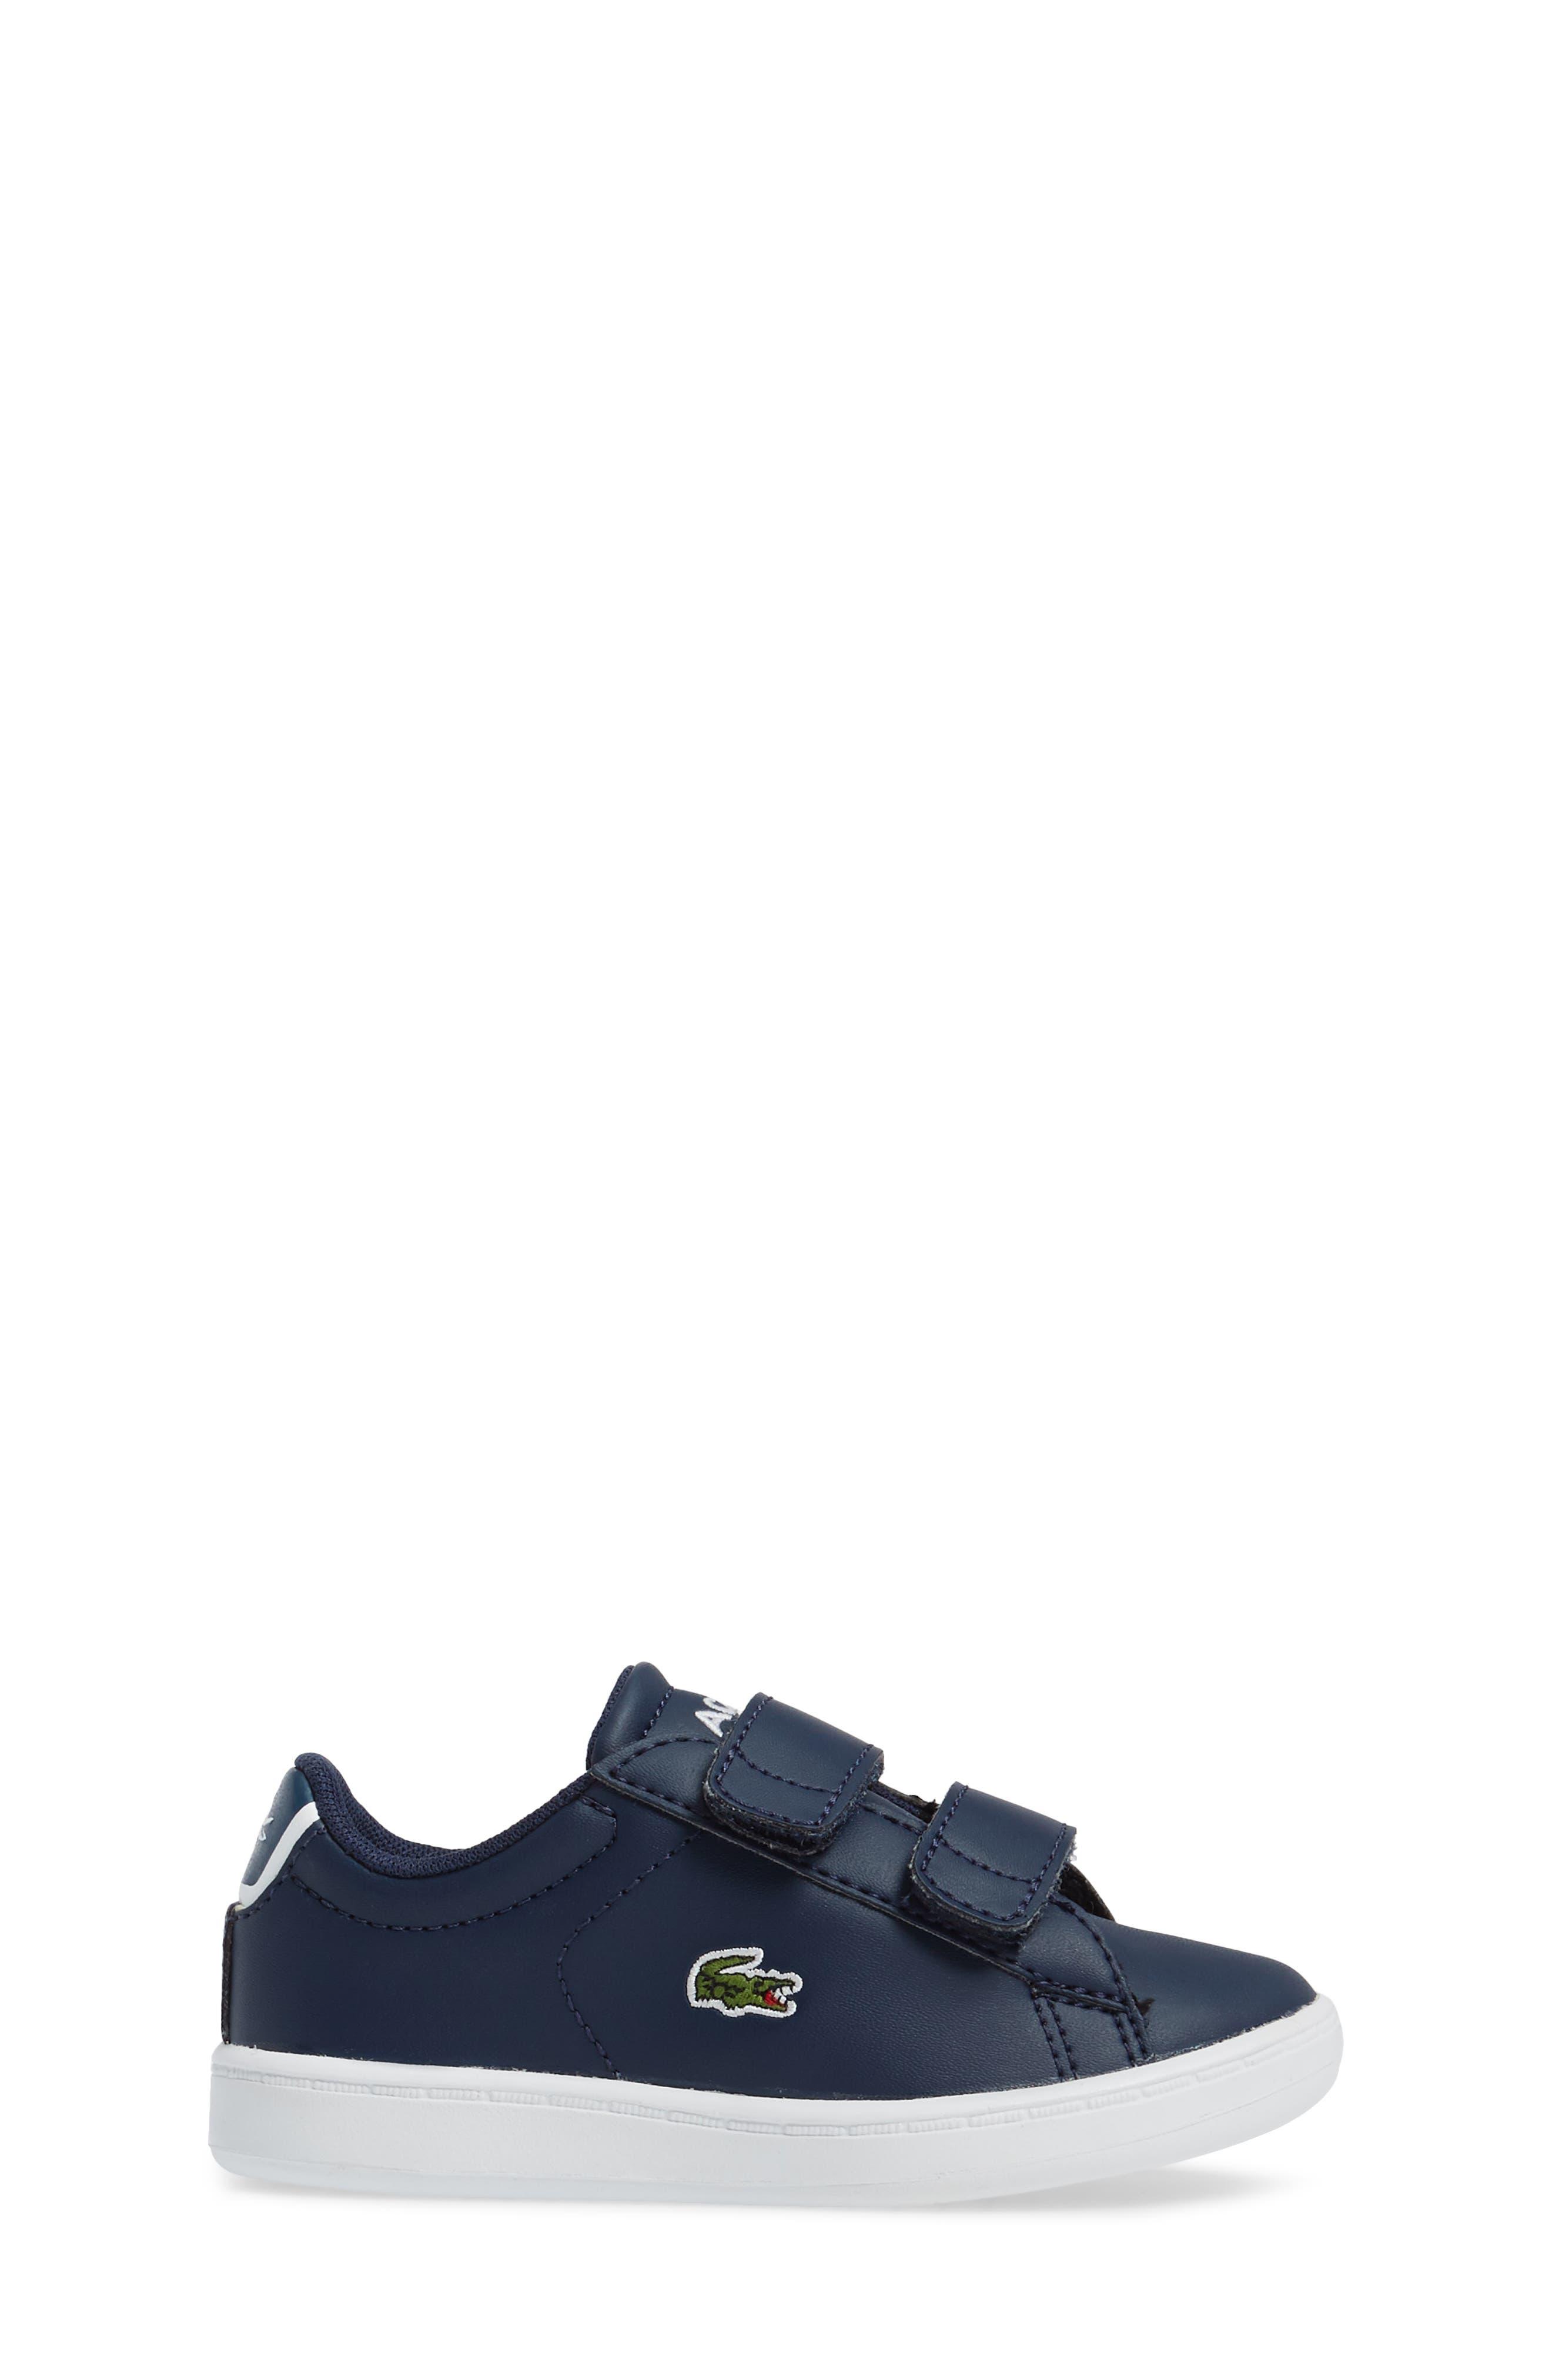 Carnaby Evo Sneaker,                             Alternate thumbnail 3, color,                             428